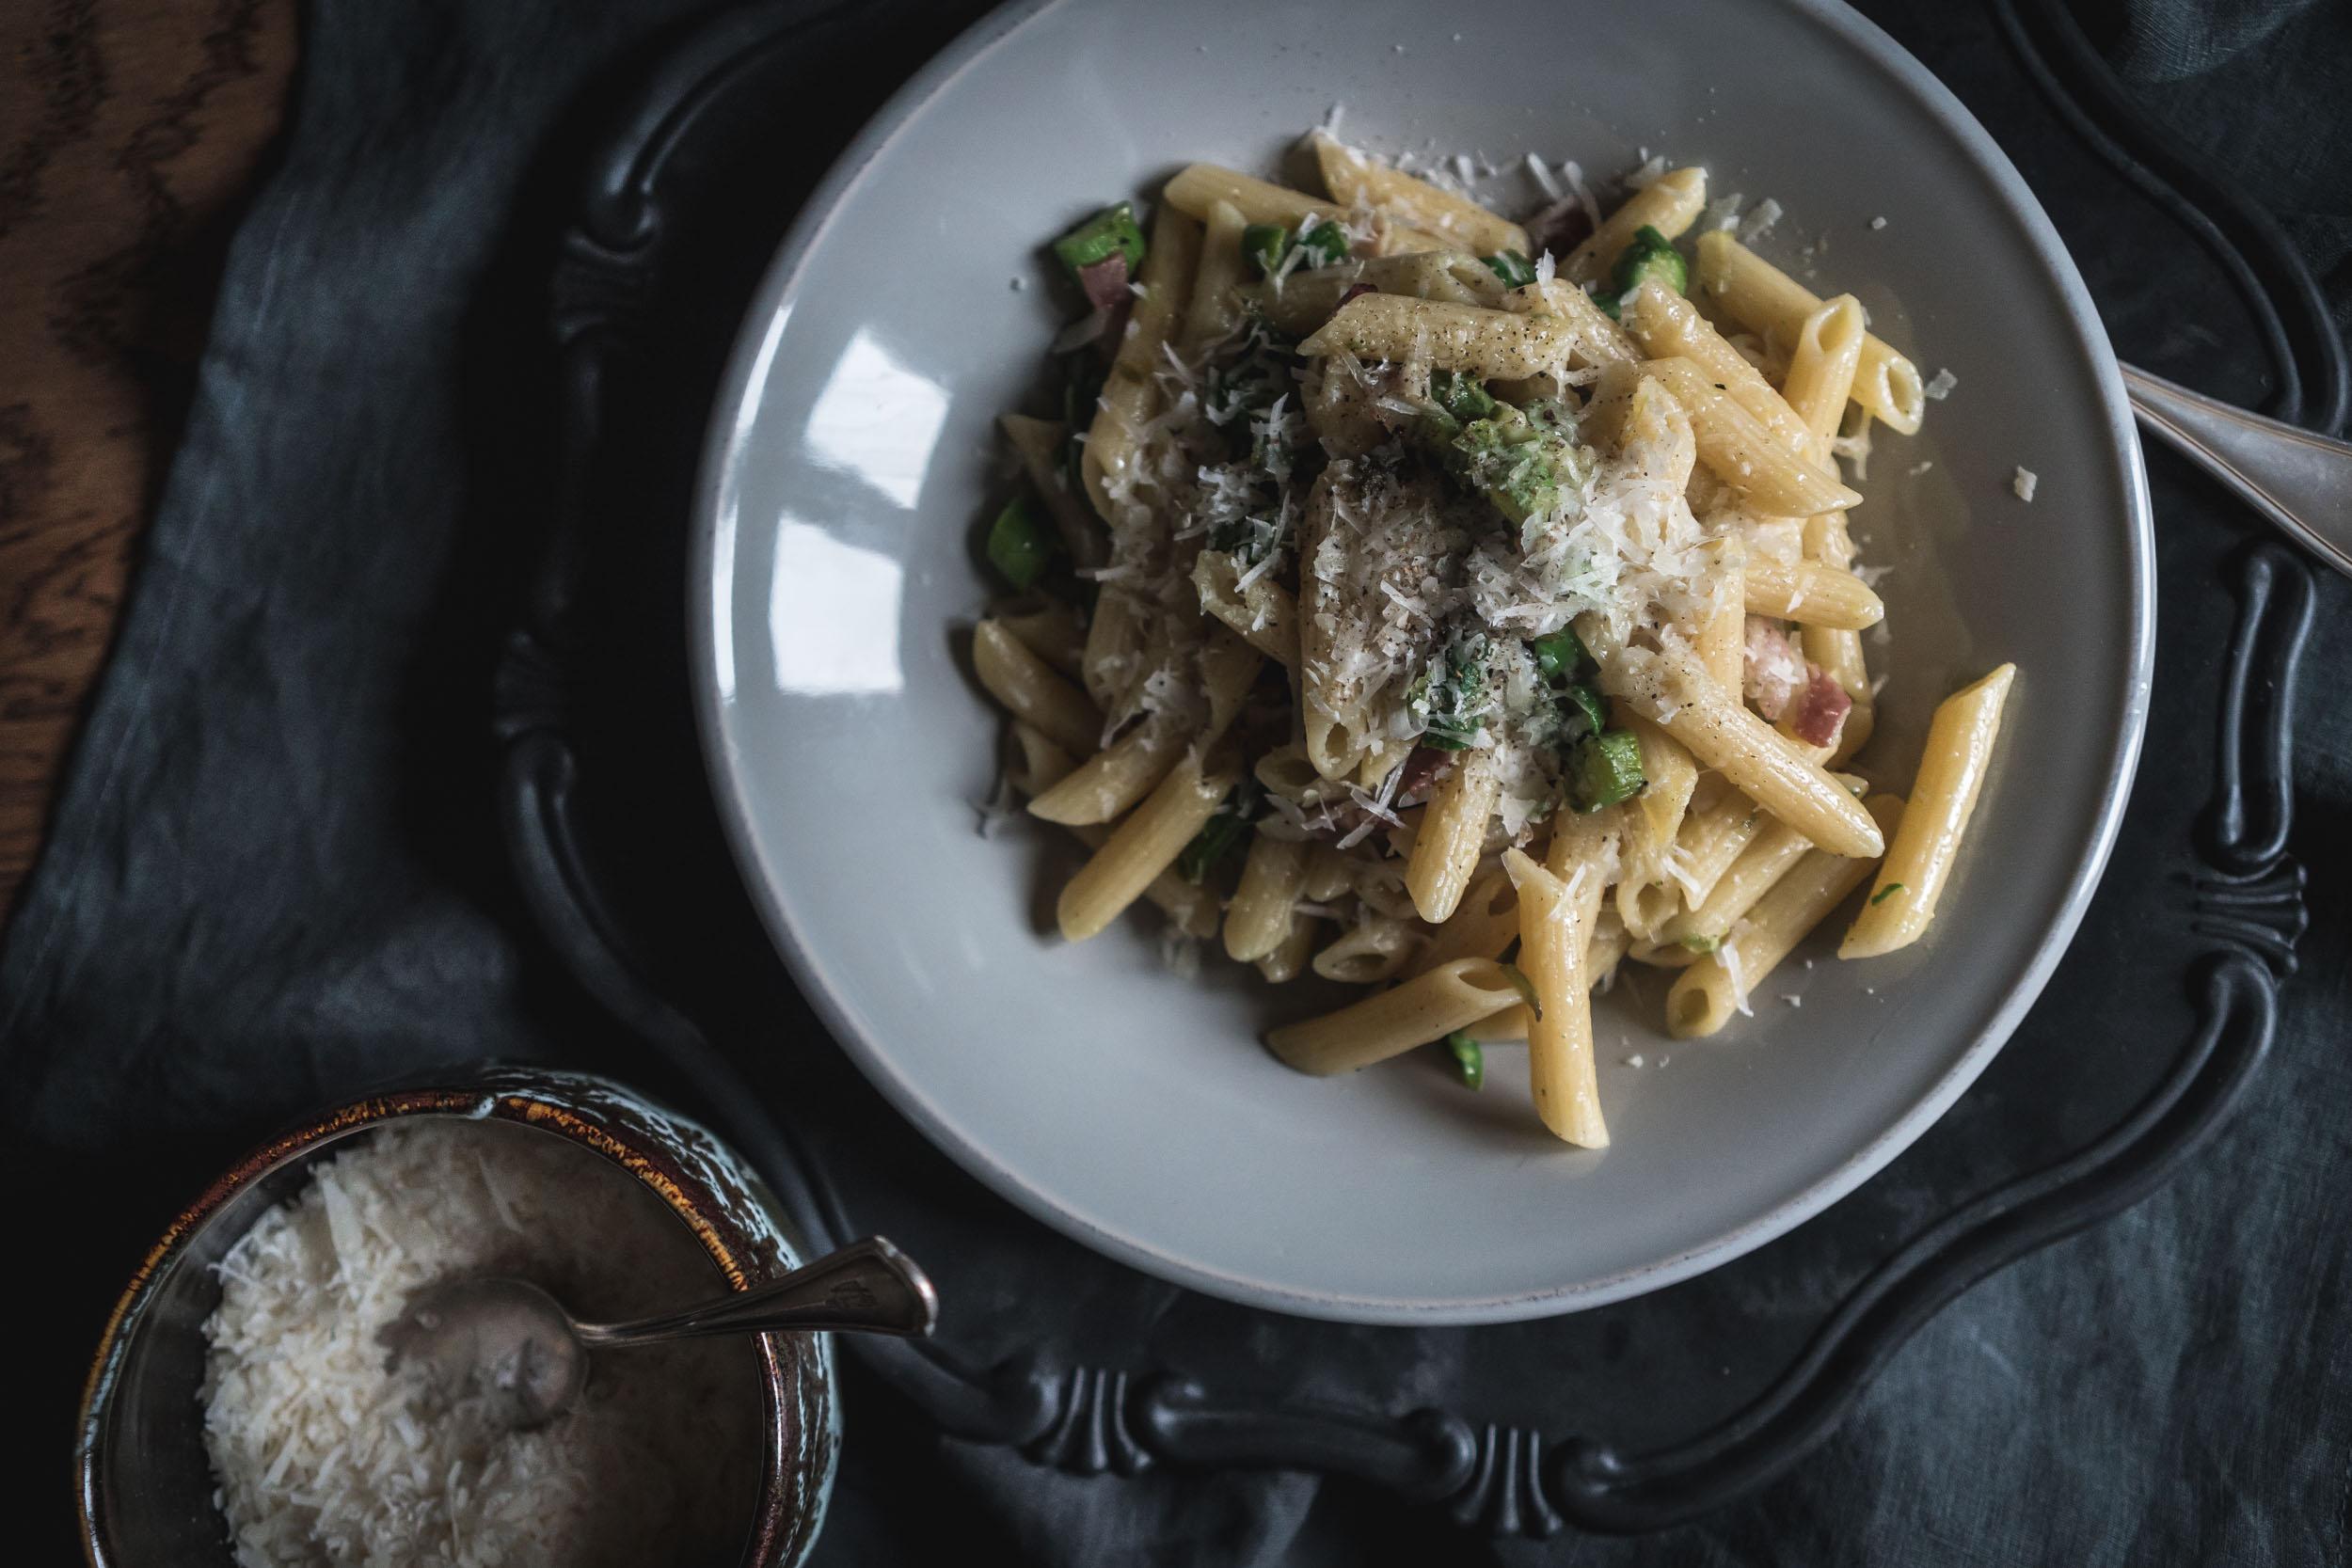 Asparagus-and-Bacon-Penne-Pasta-05135.jpg